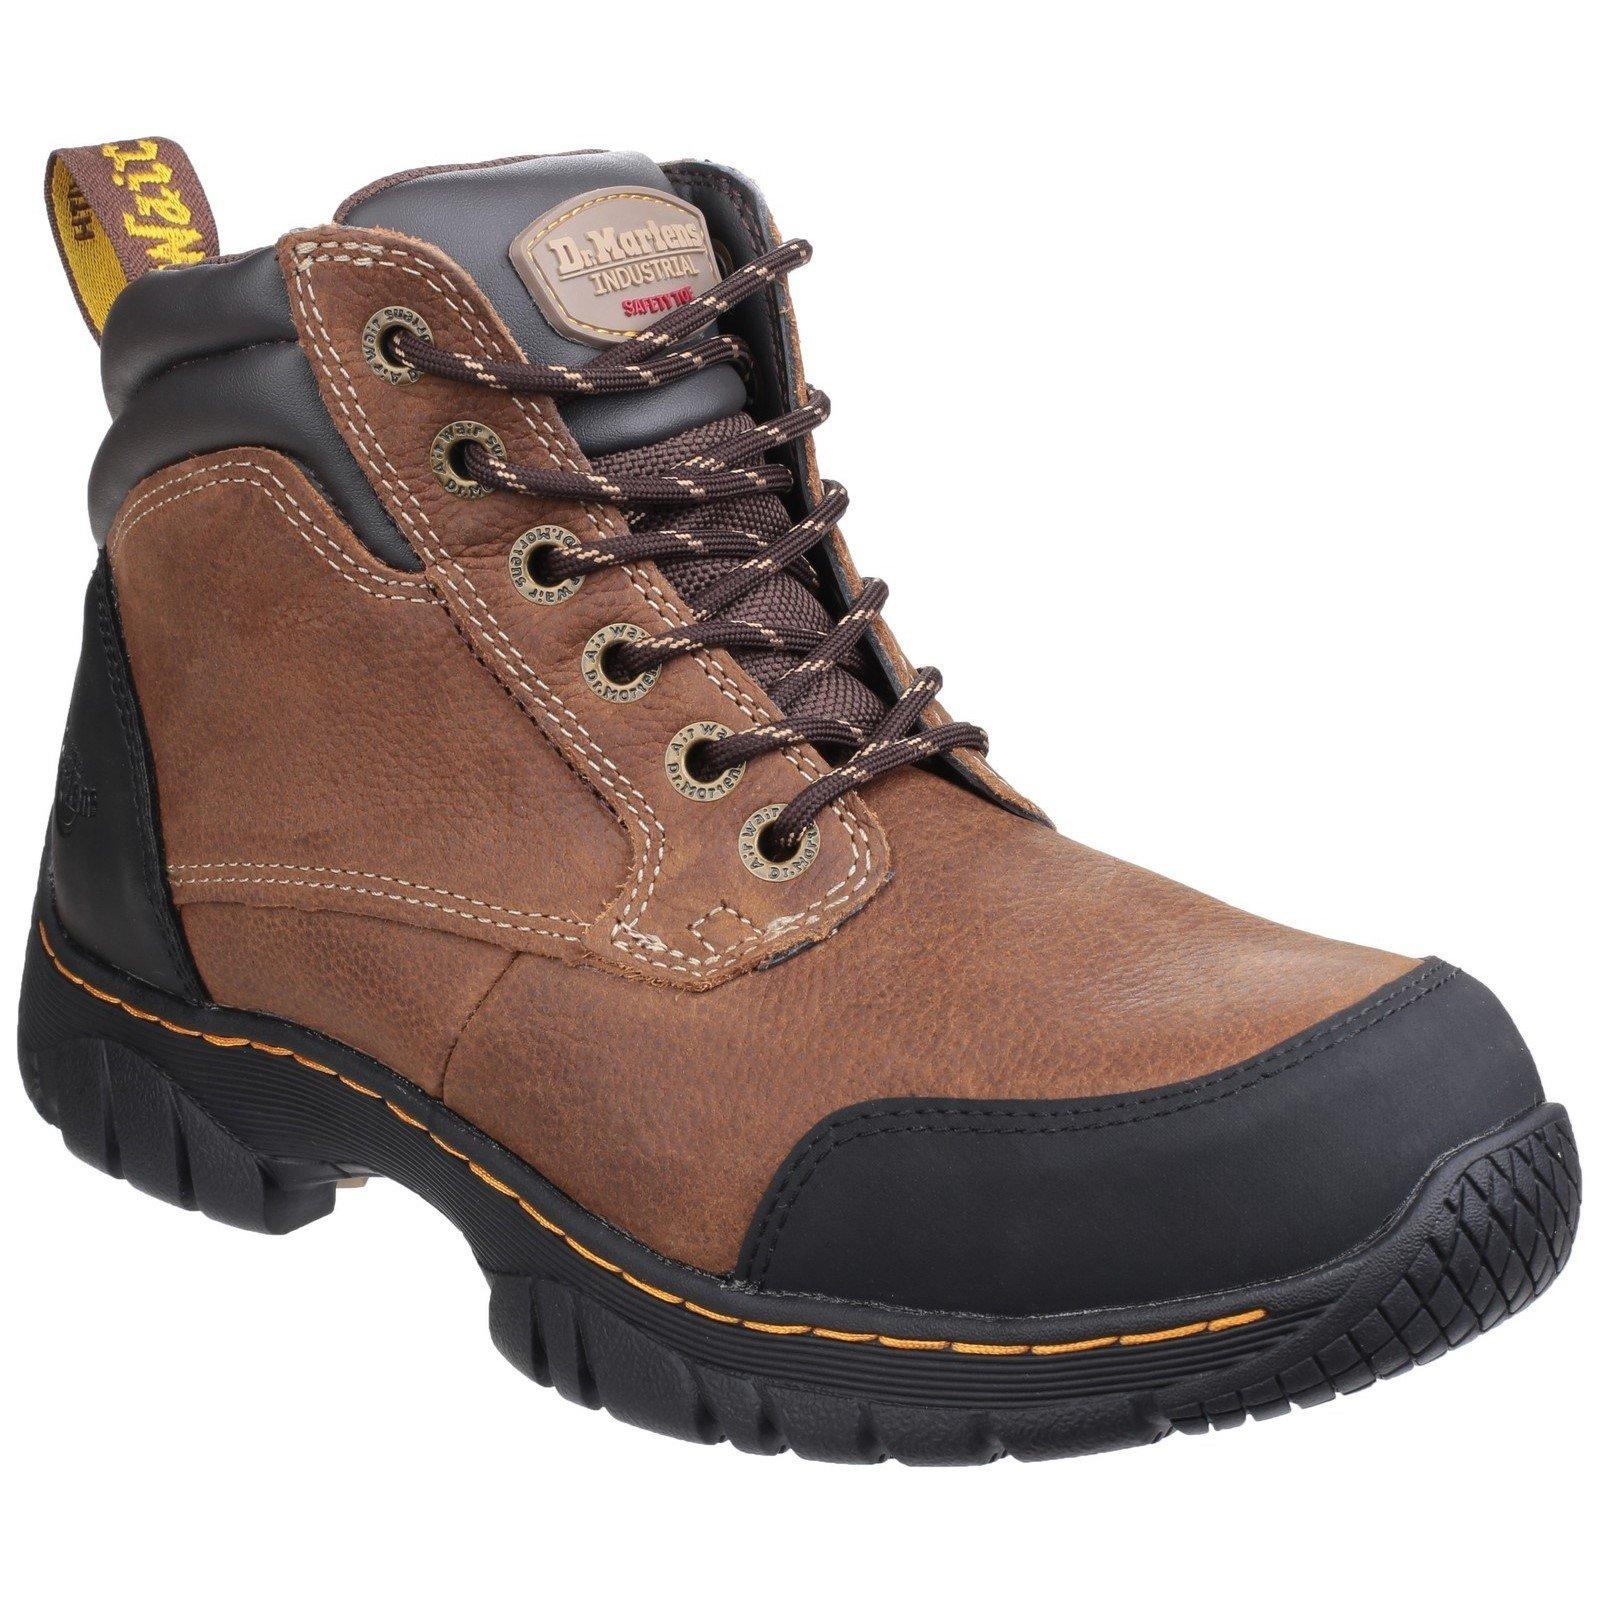 Dr Martens Unisex Riverton SB Lace up Hiker Safety Boot 24534 - Brown 7